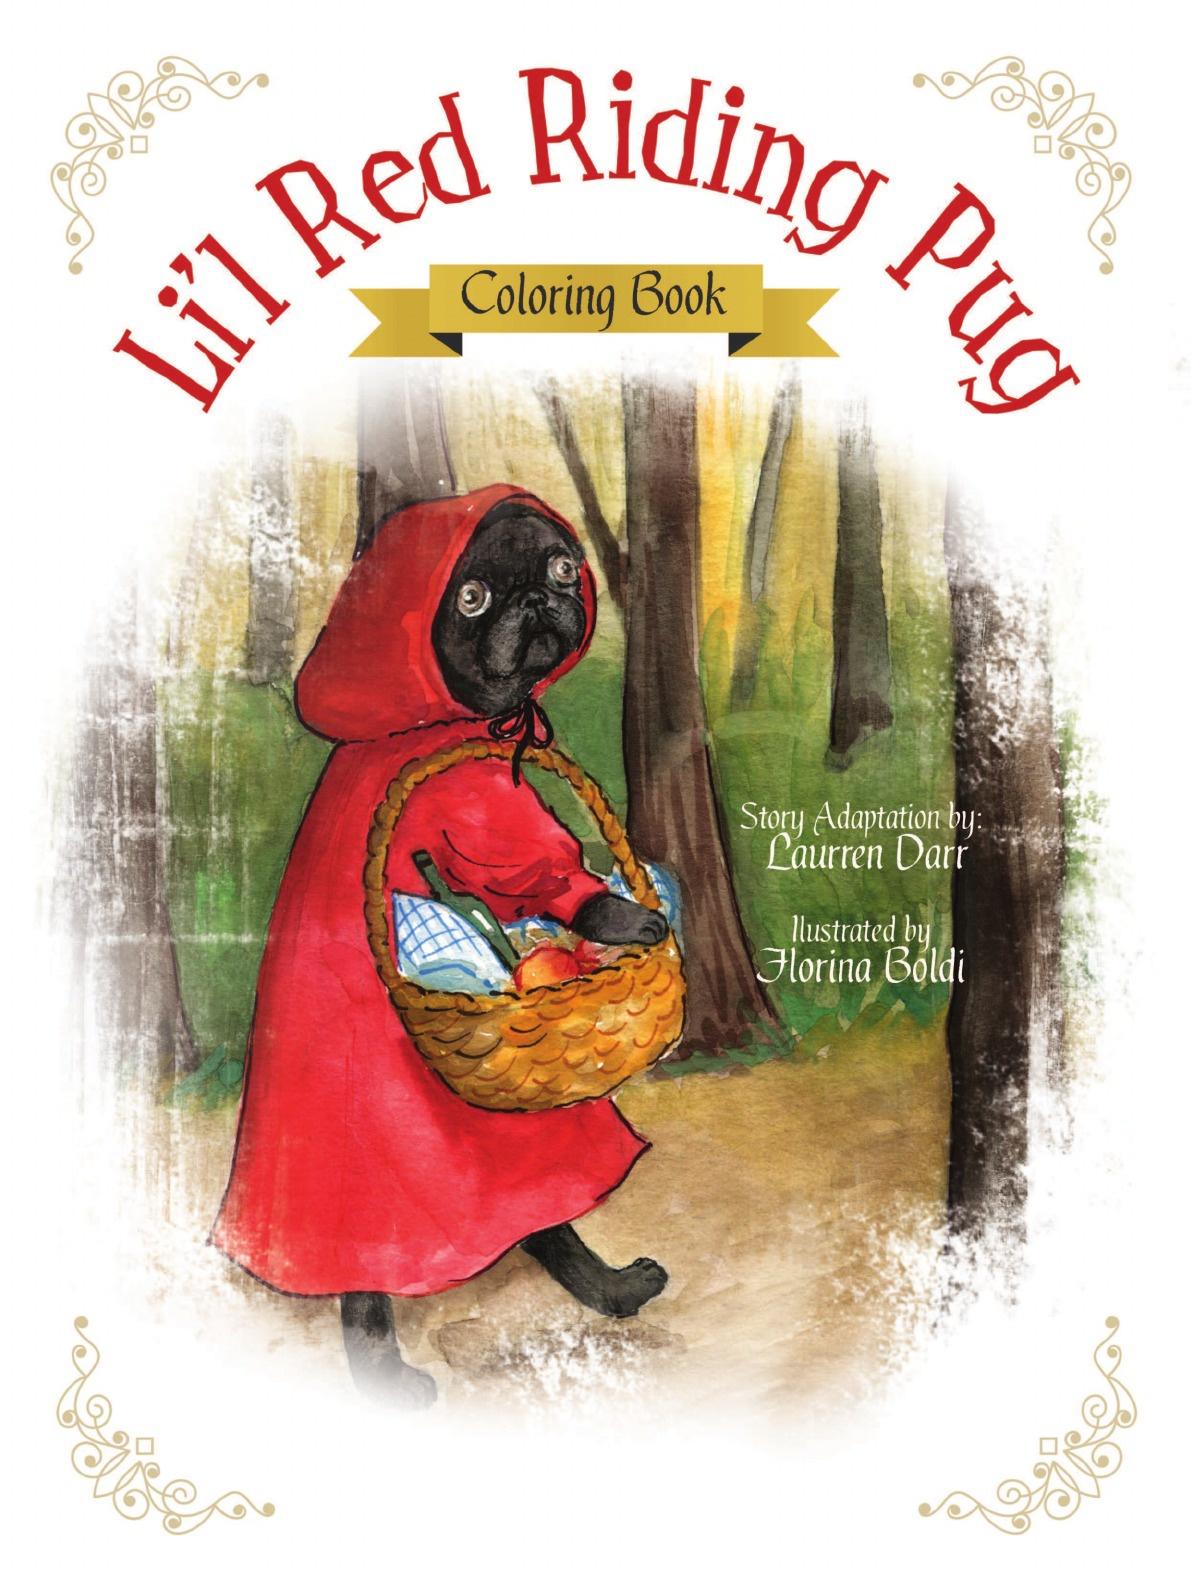 Laurren Darr Li'l Red Riding Pug - Coloring Book